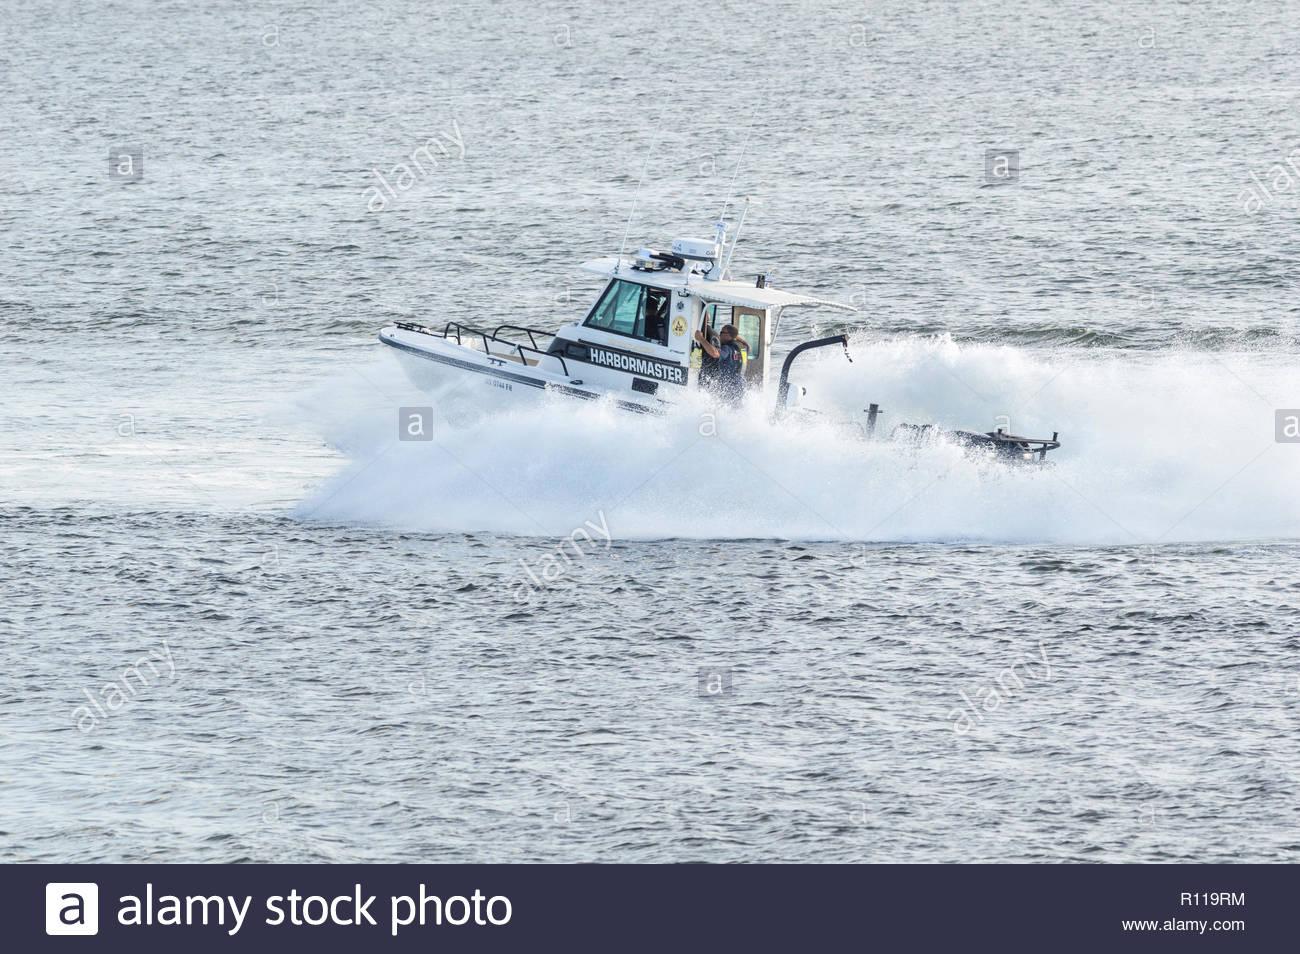 Fairhaven, Massachusetts, USA - August 31, 2018: Fairhaven harbormaster patrol boat smashing through wake of high-speed ferry - Stock Image